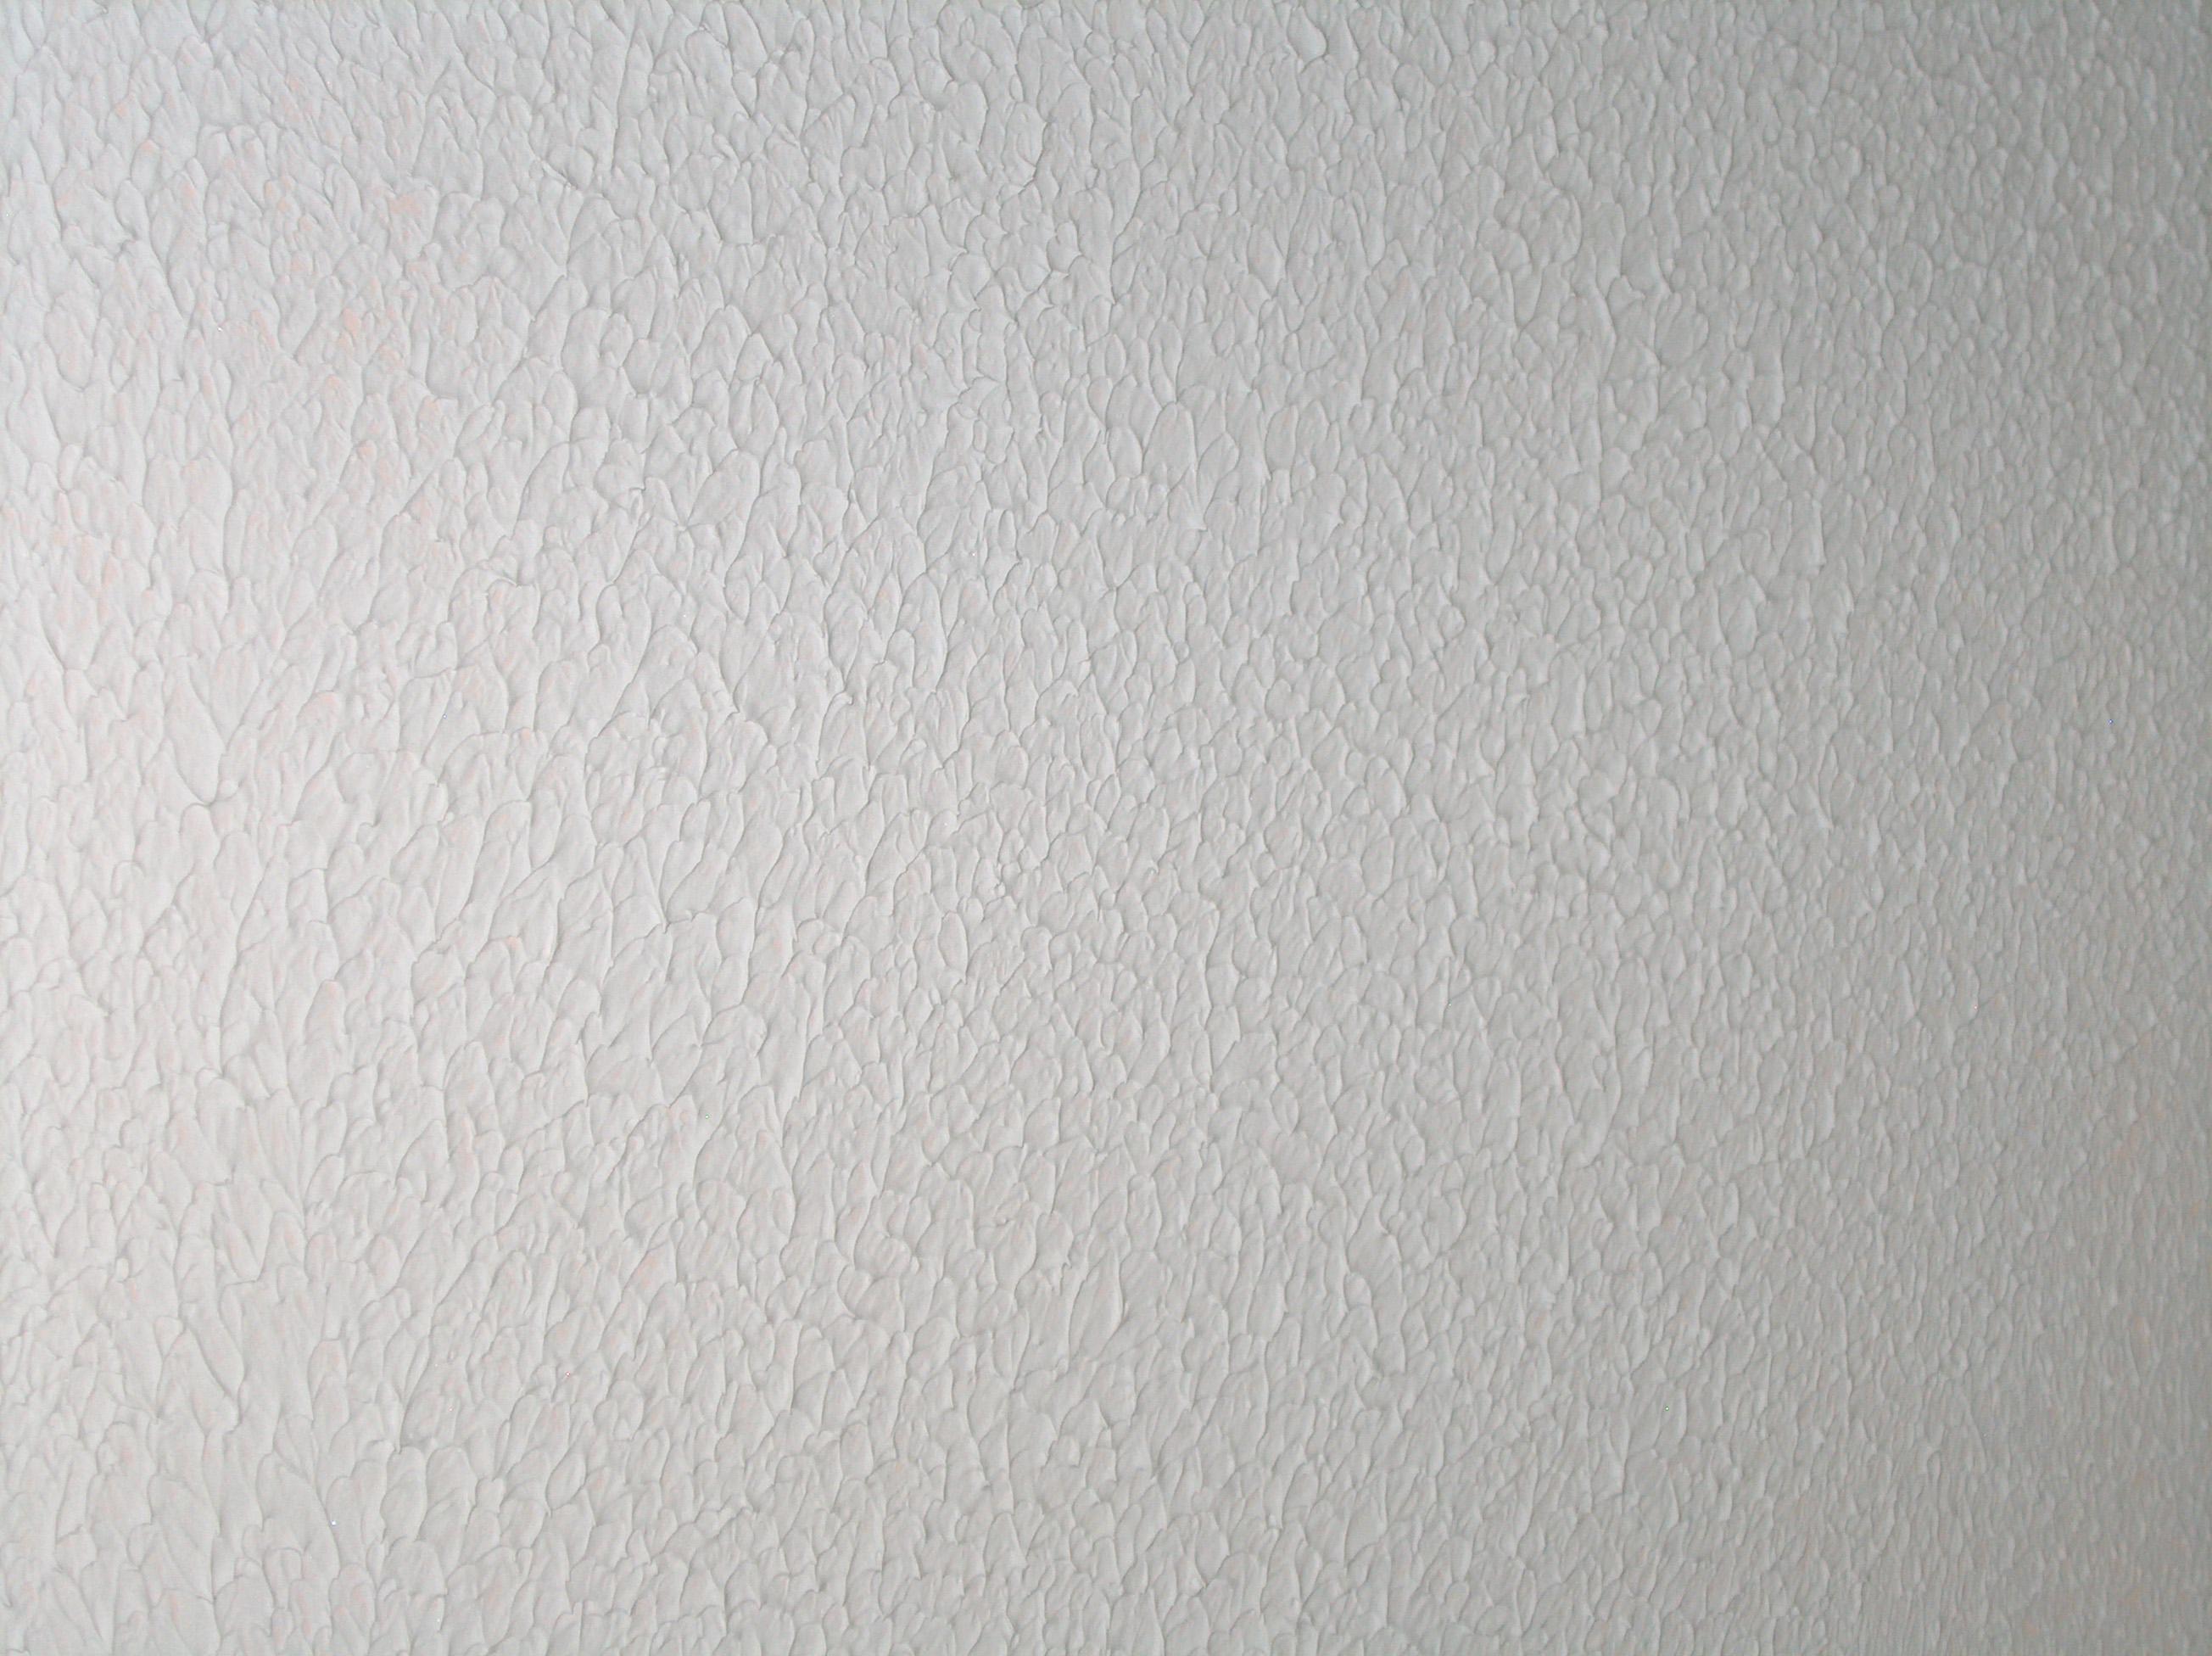 Texture Wall Paint Wonderful Home Design